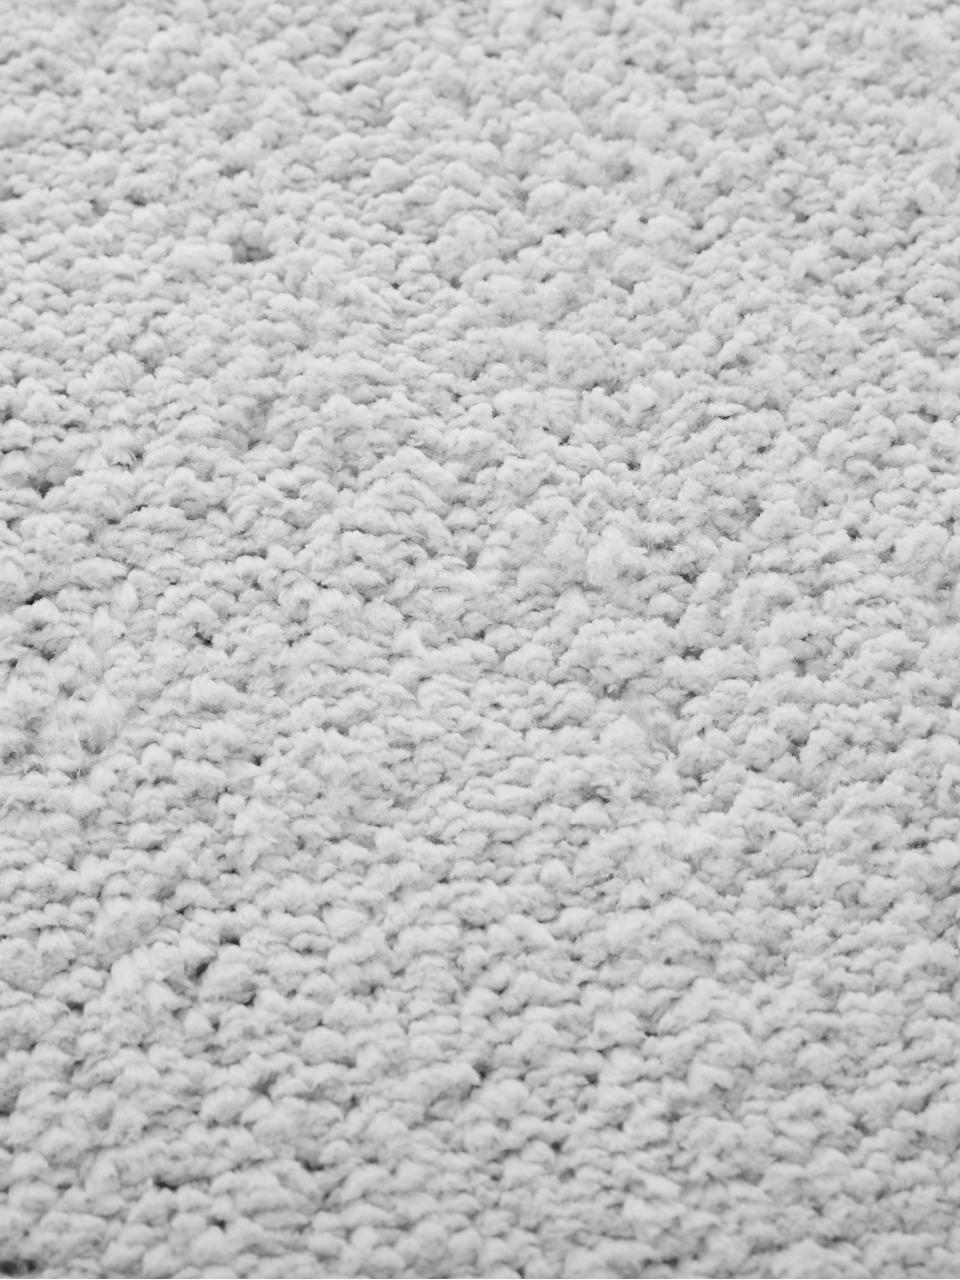 Flauschiger Hochflor-Teppich Leighton in Hellgrau, Flor: 100% Polyester (Mikrofase, Hellgrau, B 80 x L 150 cm (Grösse XS)